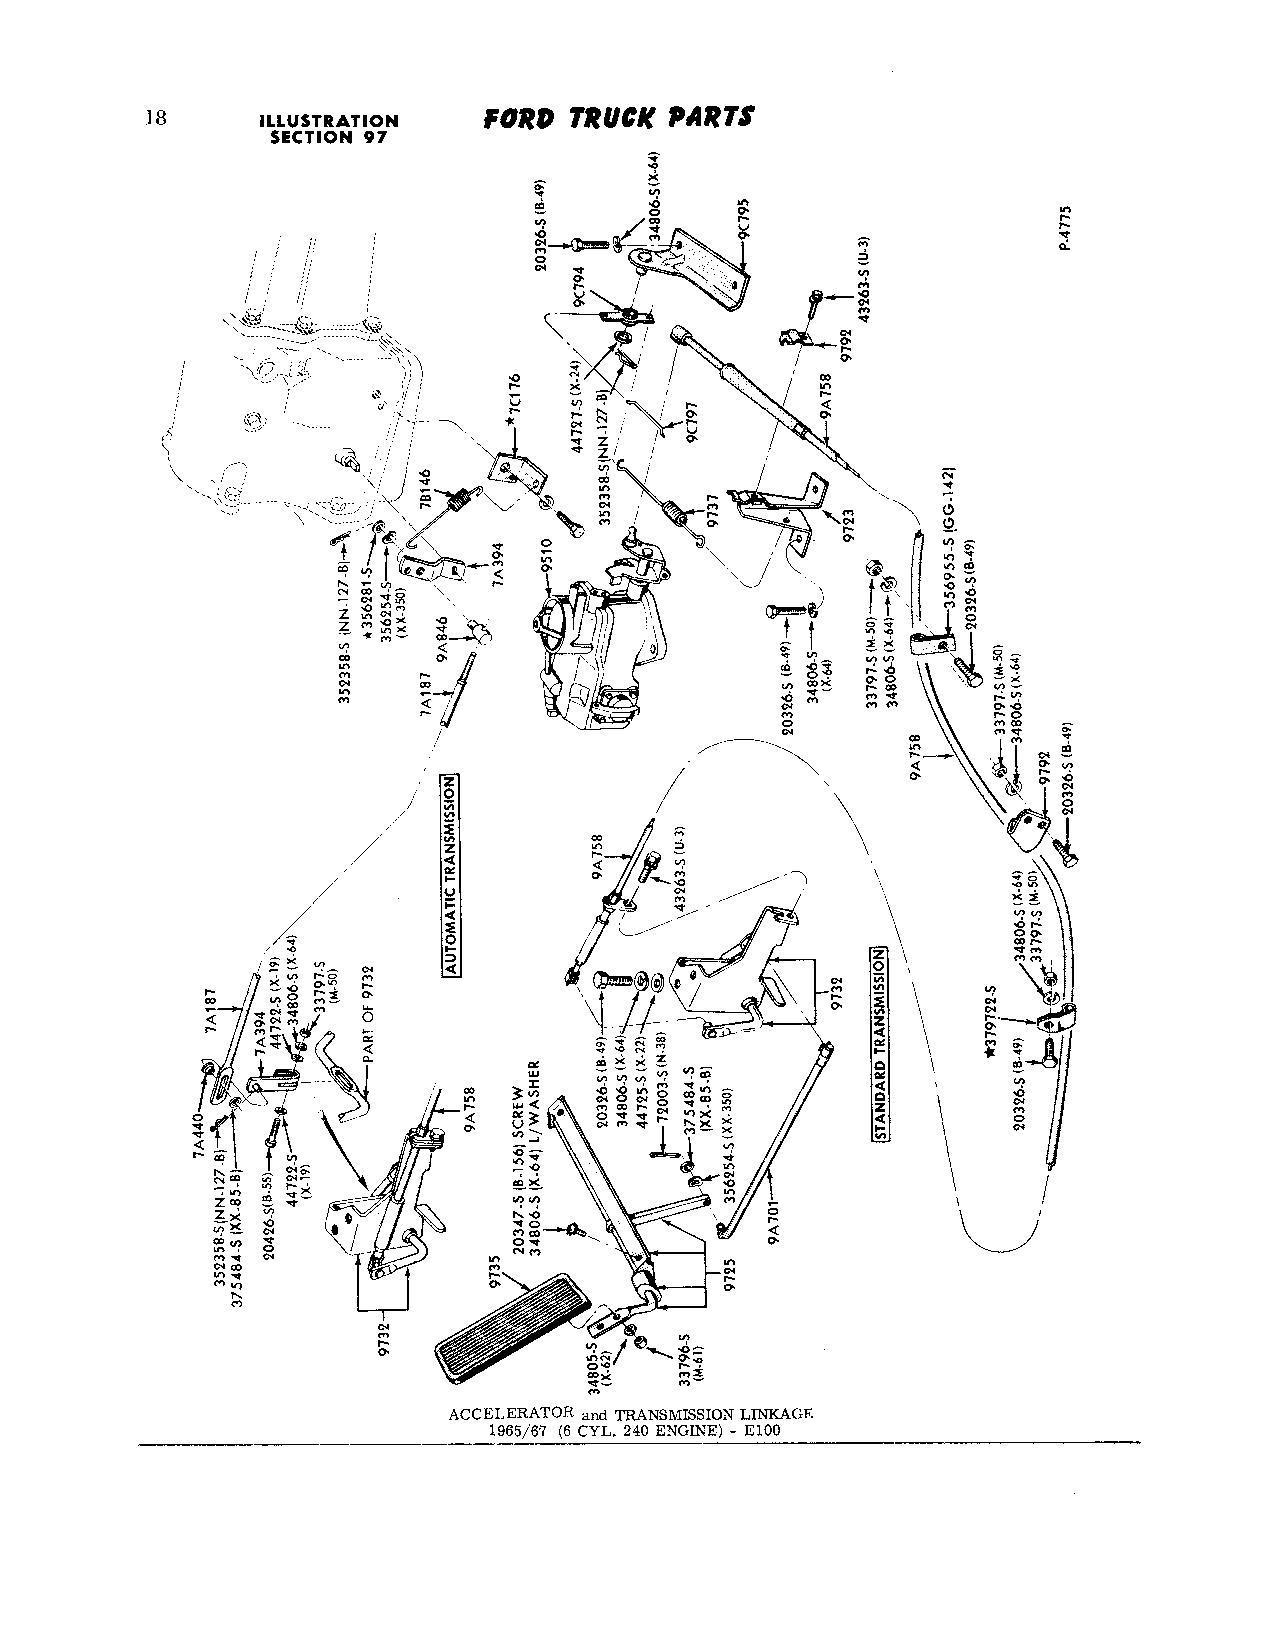 Throttle Linkage Diagram/photo request 68 240 CID F-100